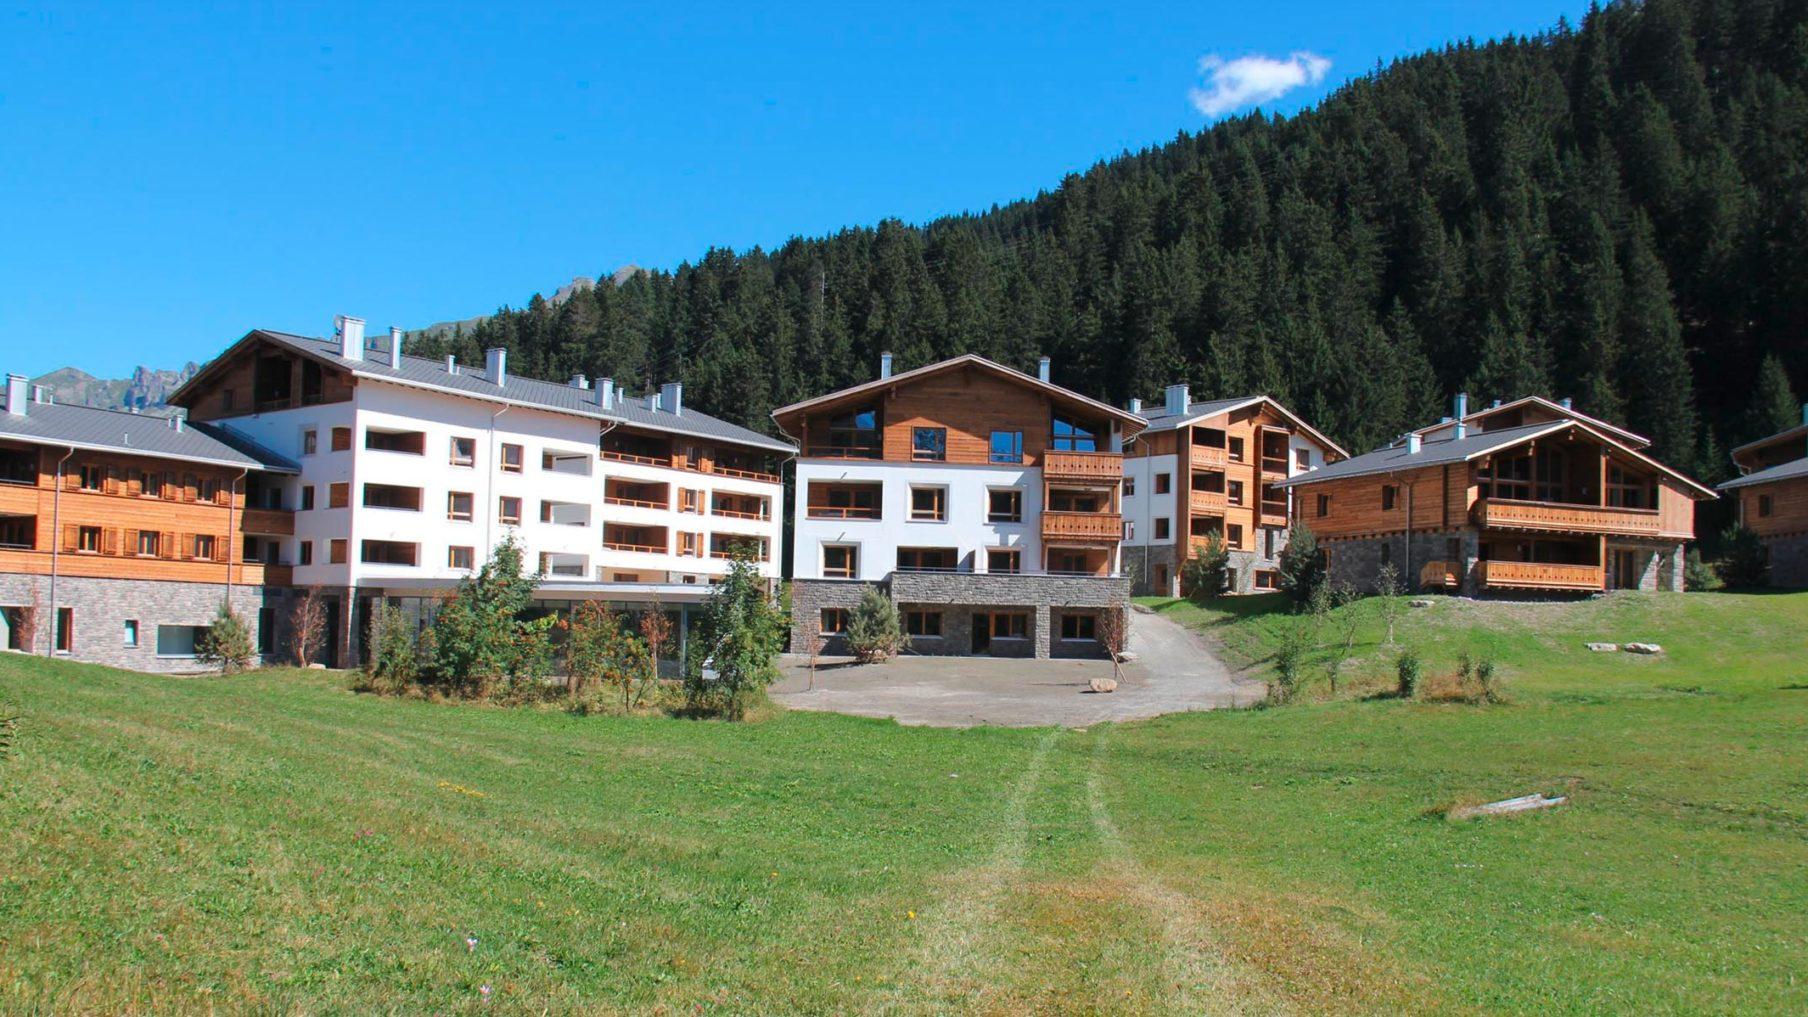 Ferienresort AlpinLodges Lenzerheide (Fertigstellung 2013)